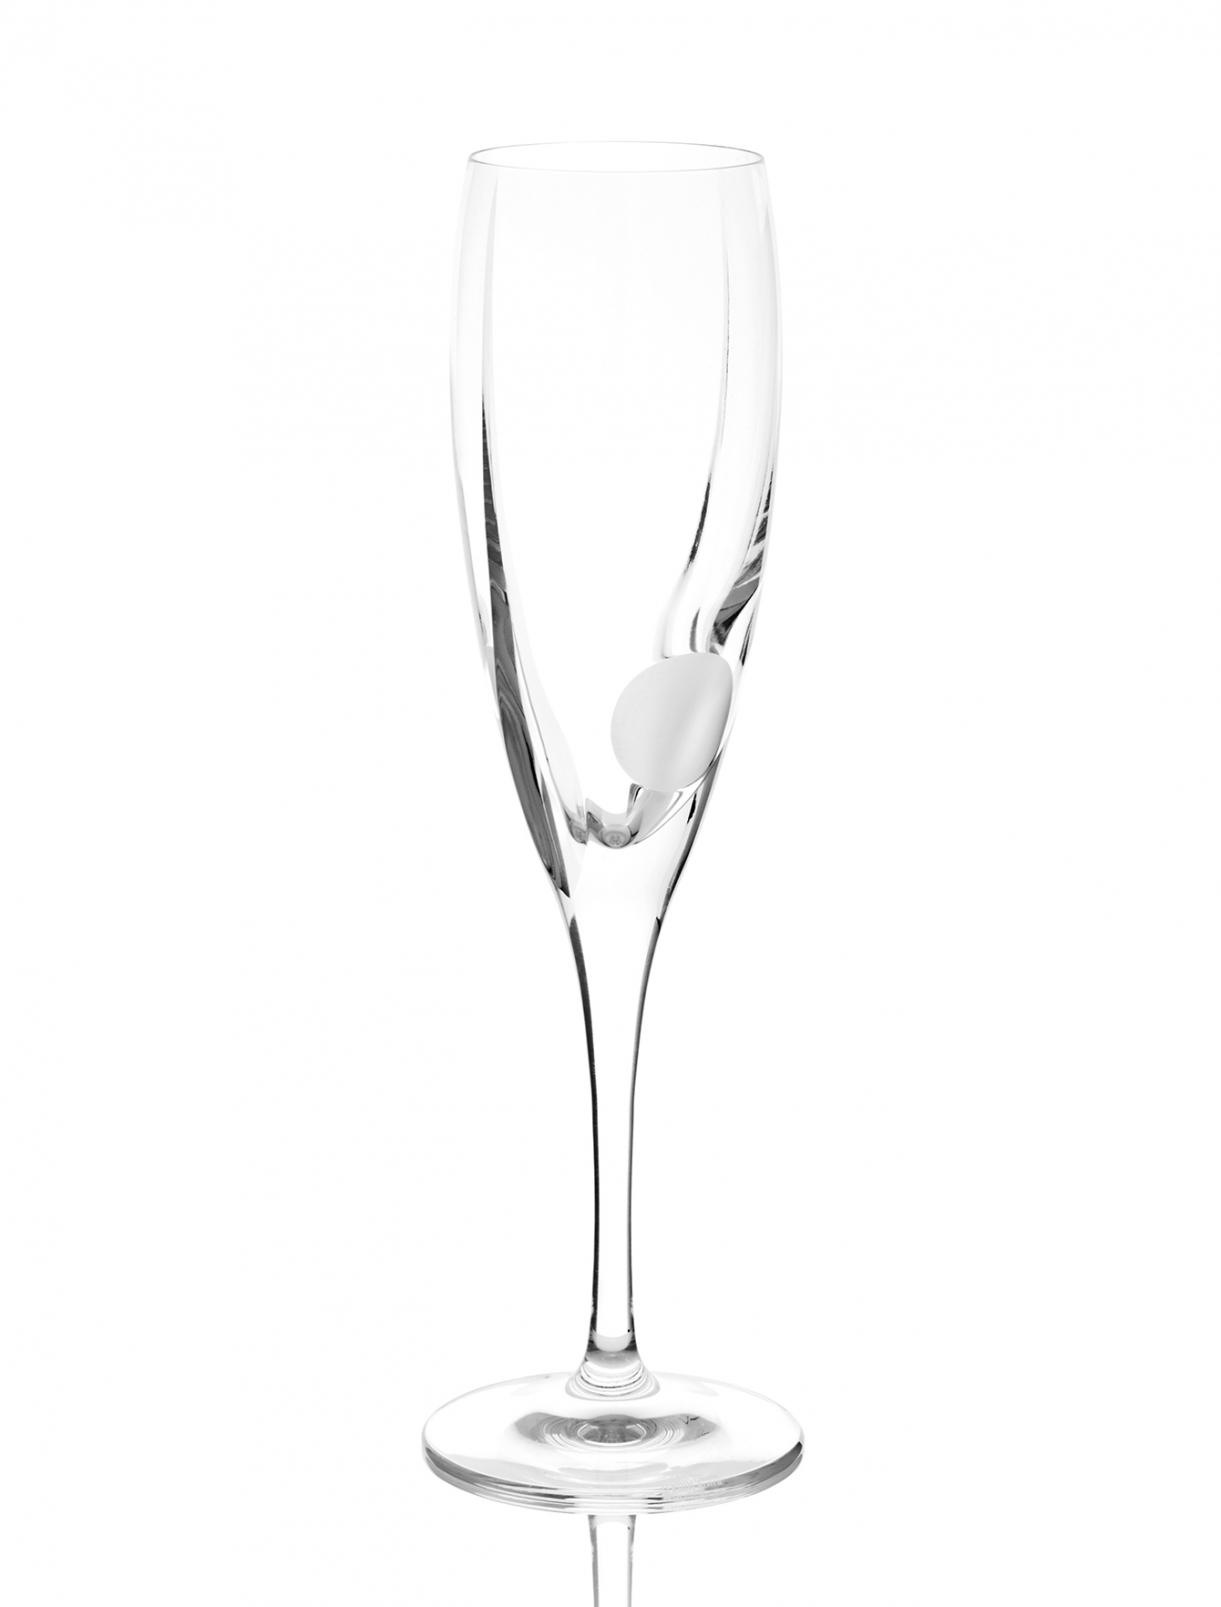 Бокал 22.5 см Mario Cioni  –  Общий вид